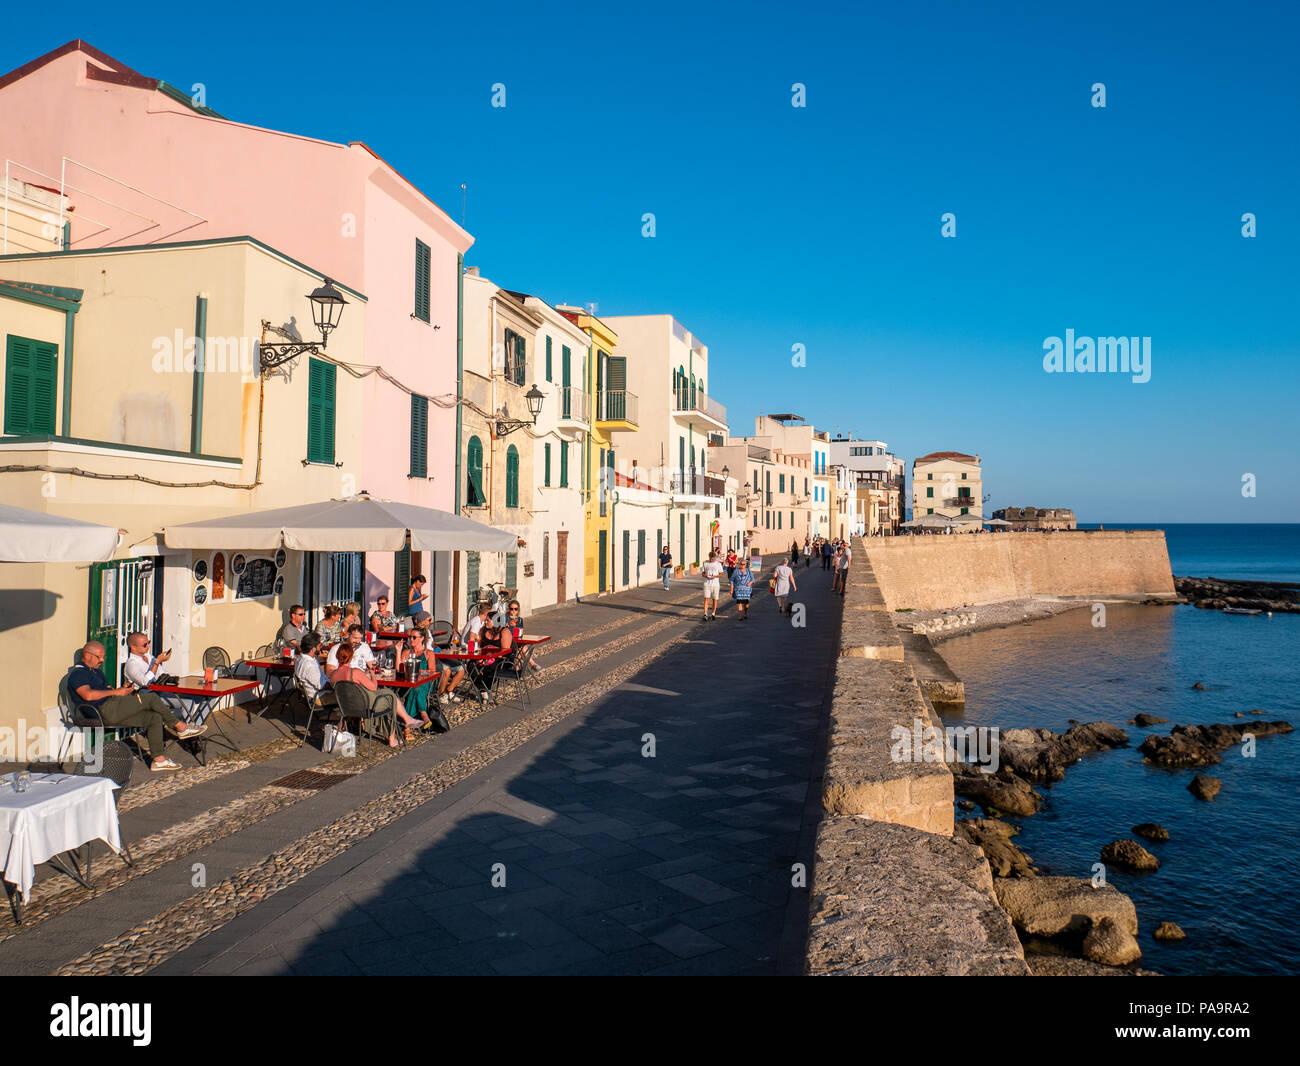 Waterfront bar on the promenade, Alghero, Sardinia, Italy - Stock Image